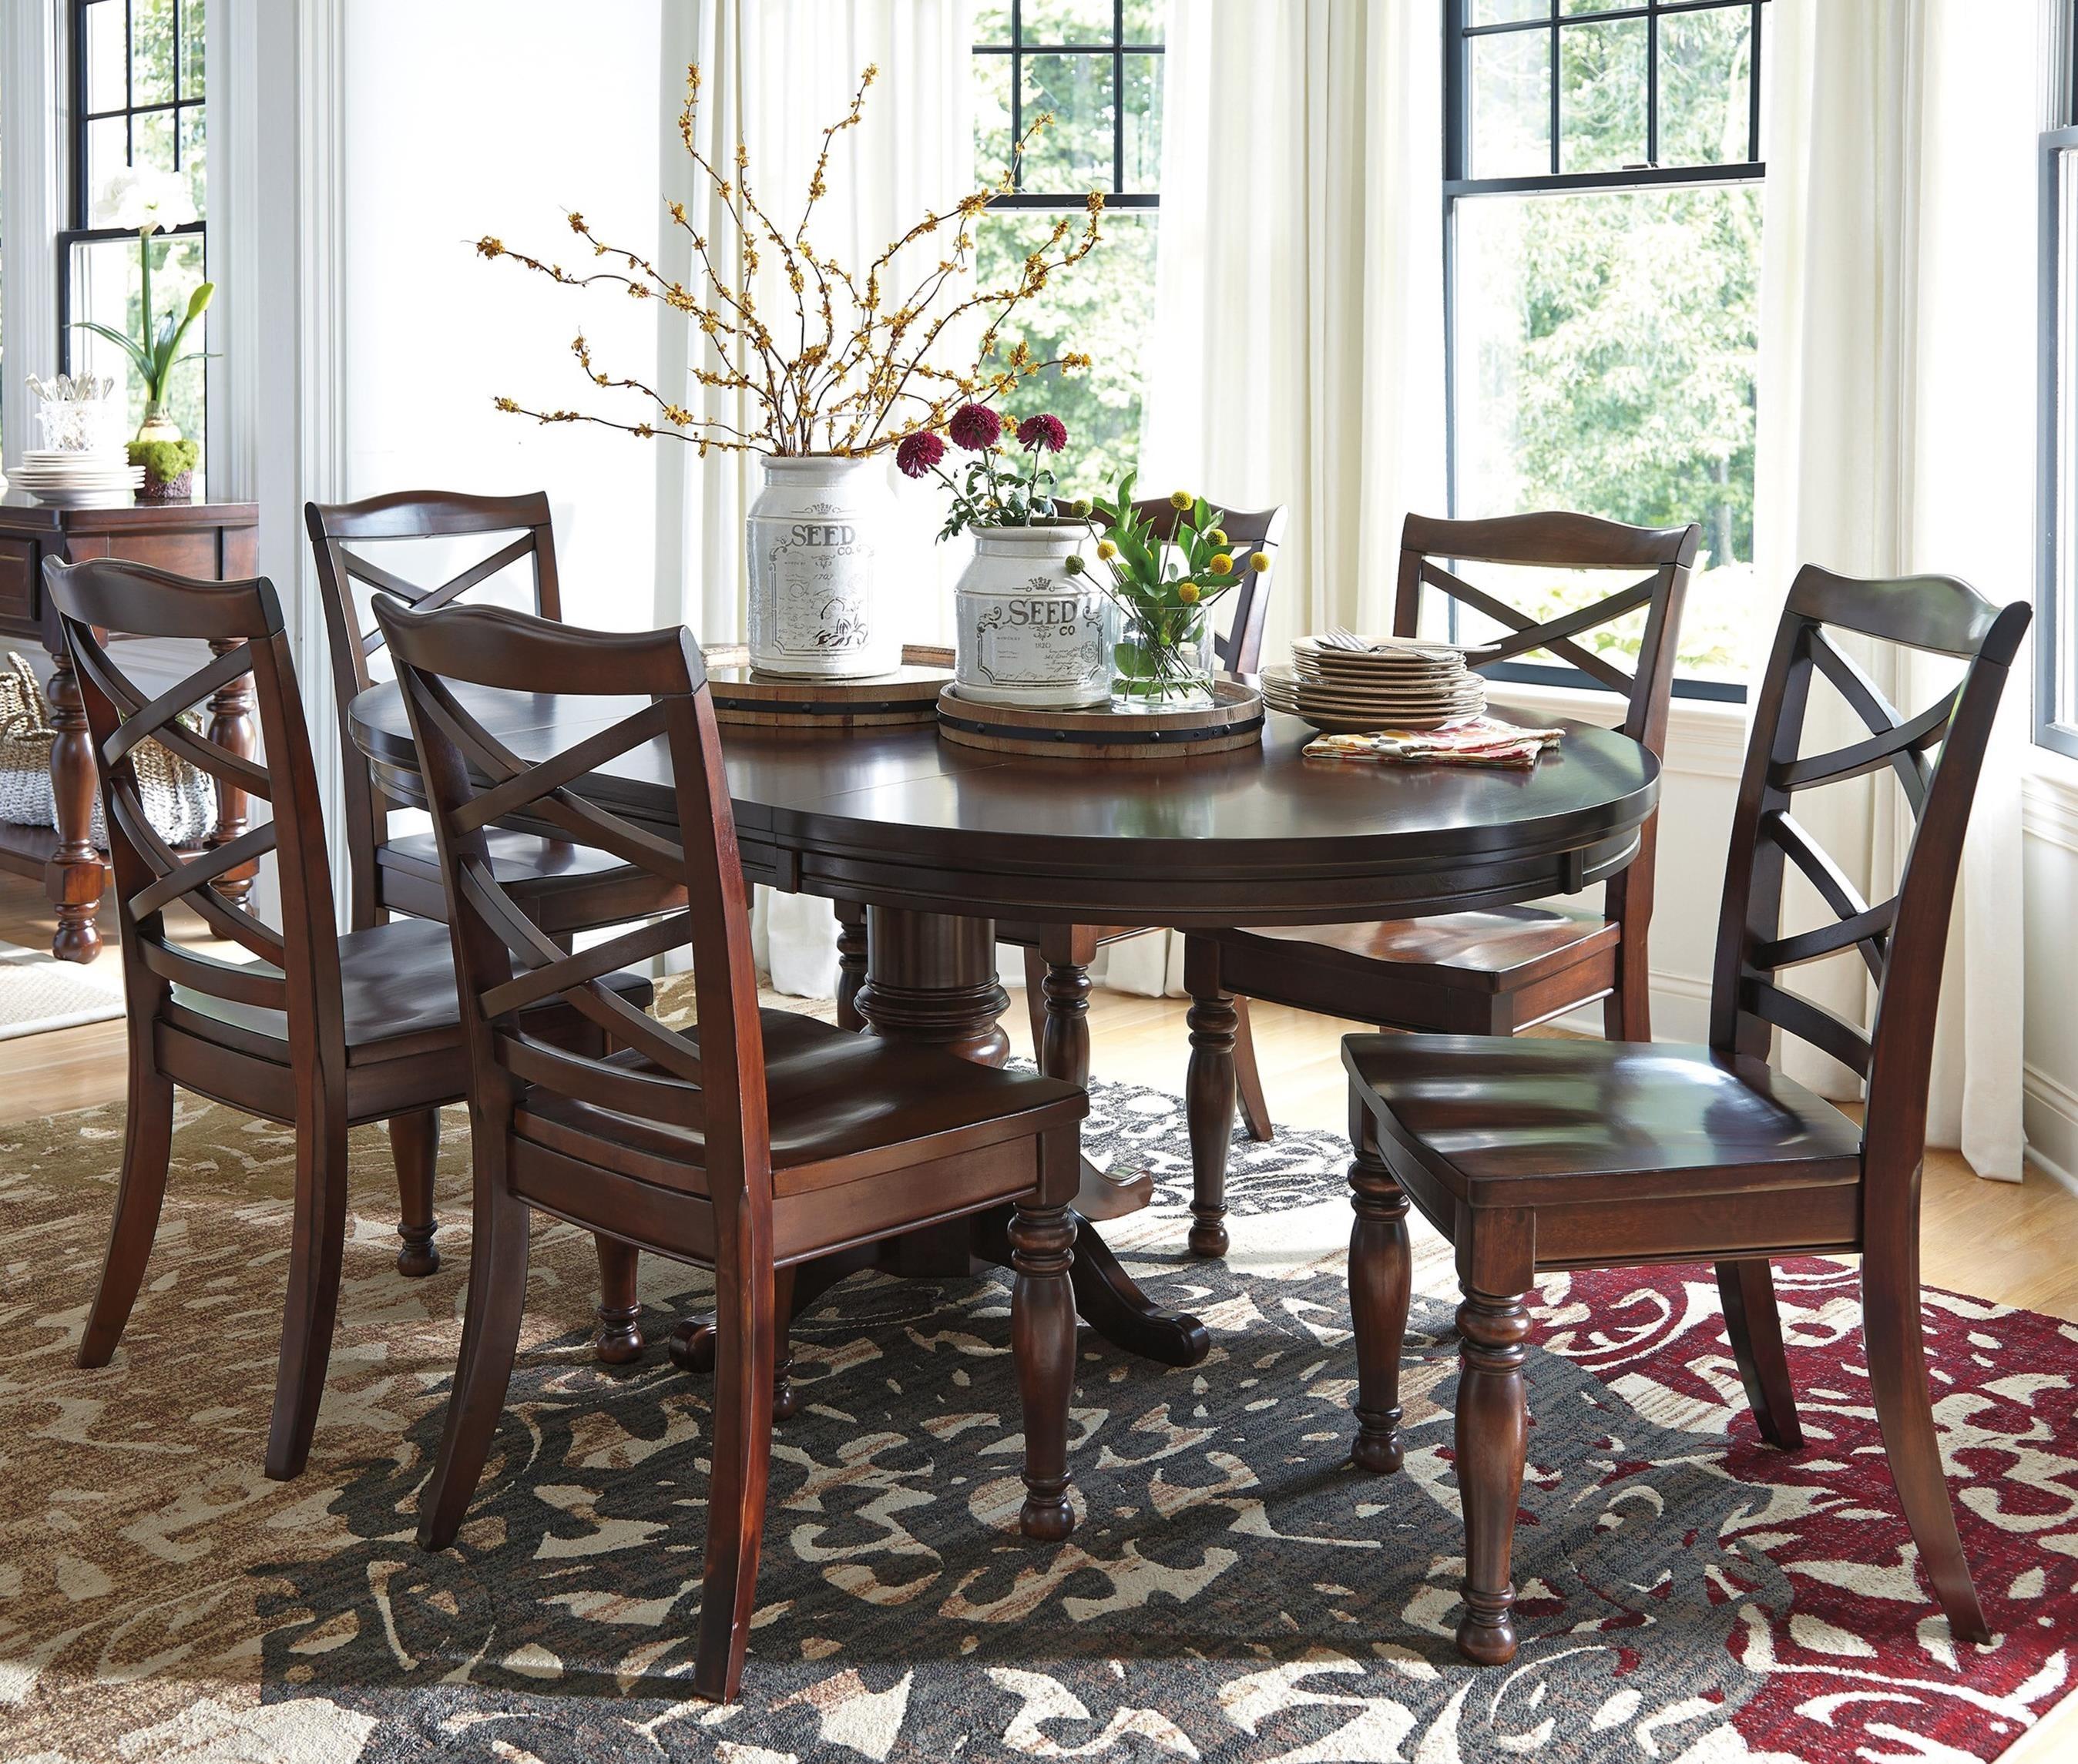 Ashley Furniture Porter 7 Piece Round Dining Table Set